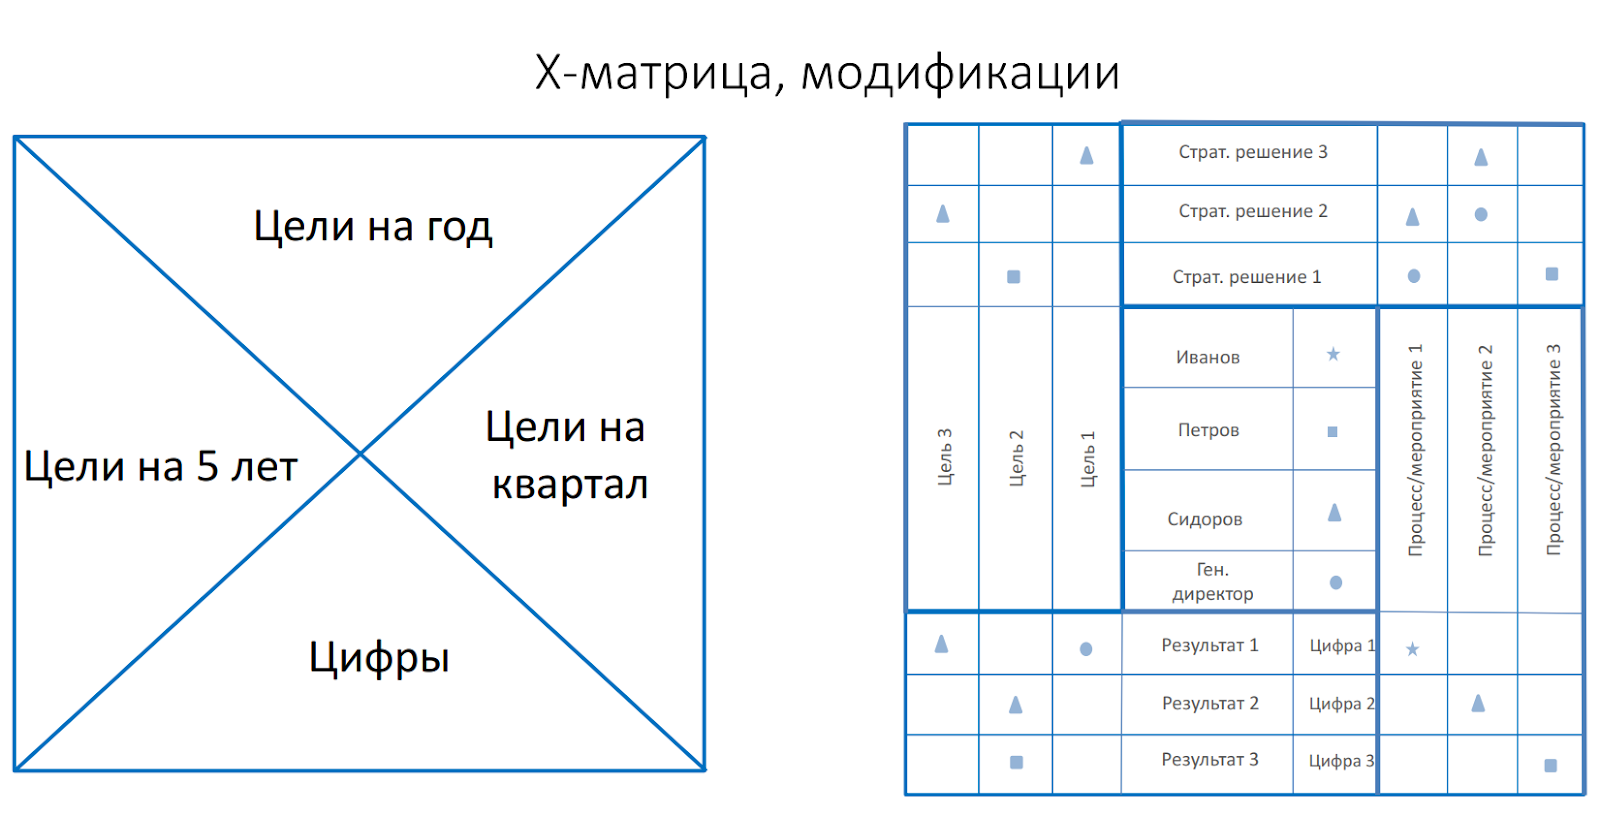 модификации Х-матрицы